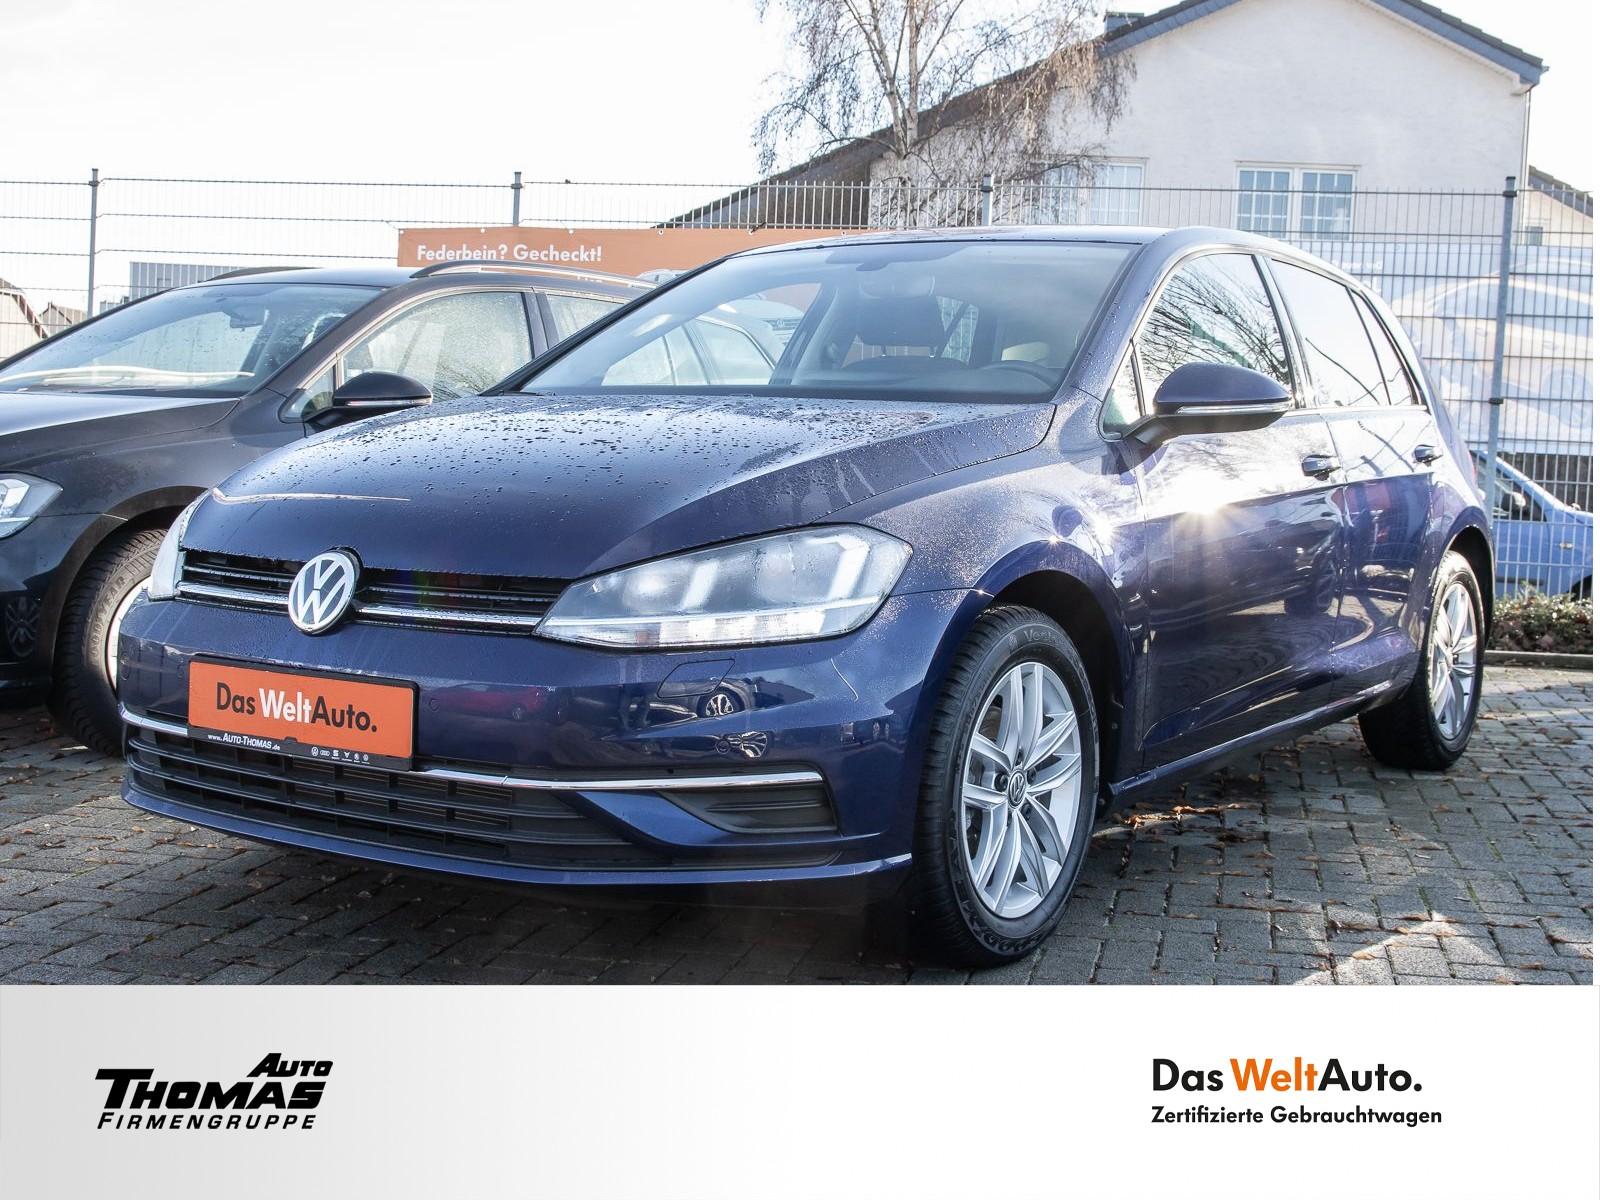 Volkswagen Golf 1,0 CLomfortline BT 85 TSI 6 Gang, Jahr 2019, Benzin